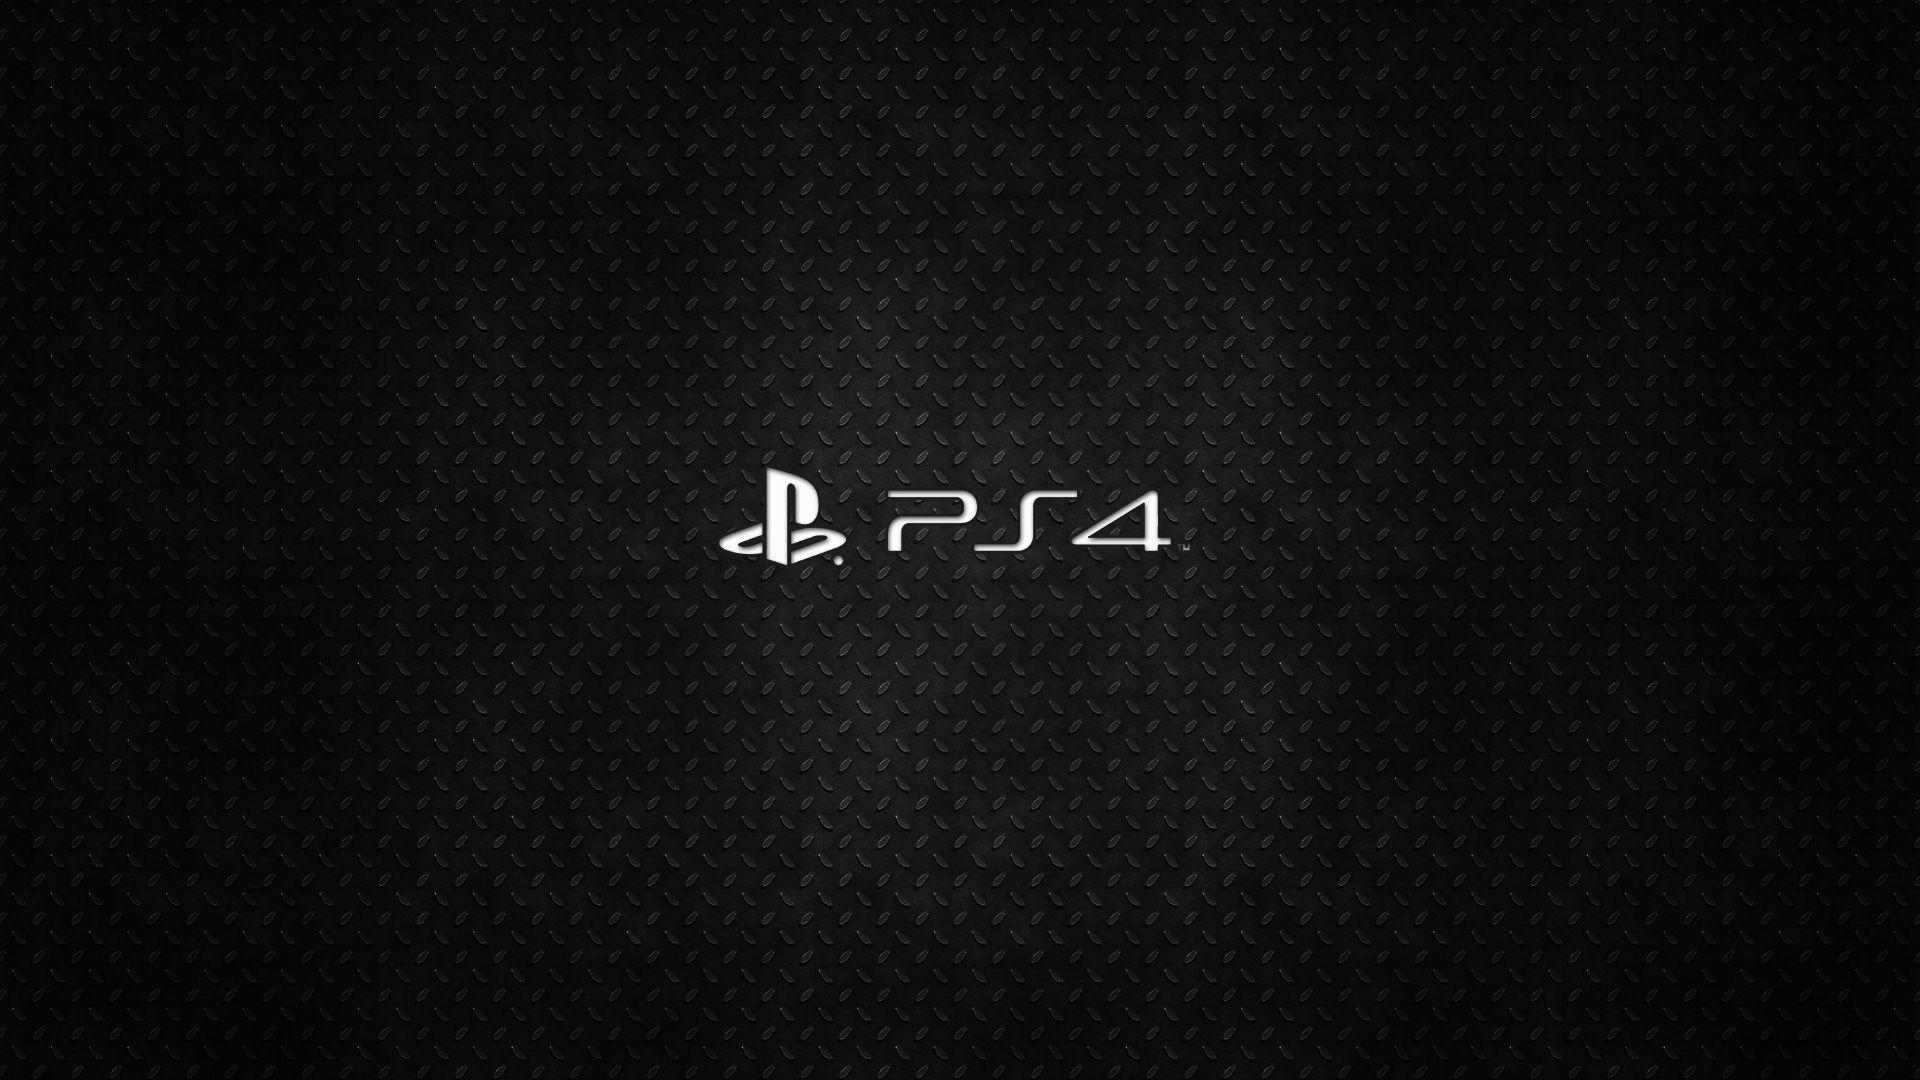 Playstation 4 29 Mart Guncelleme Haberi Background Hd Wallpaper Playstation Playstation Logo